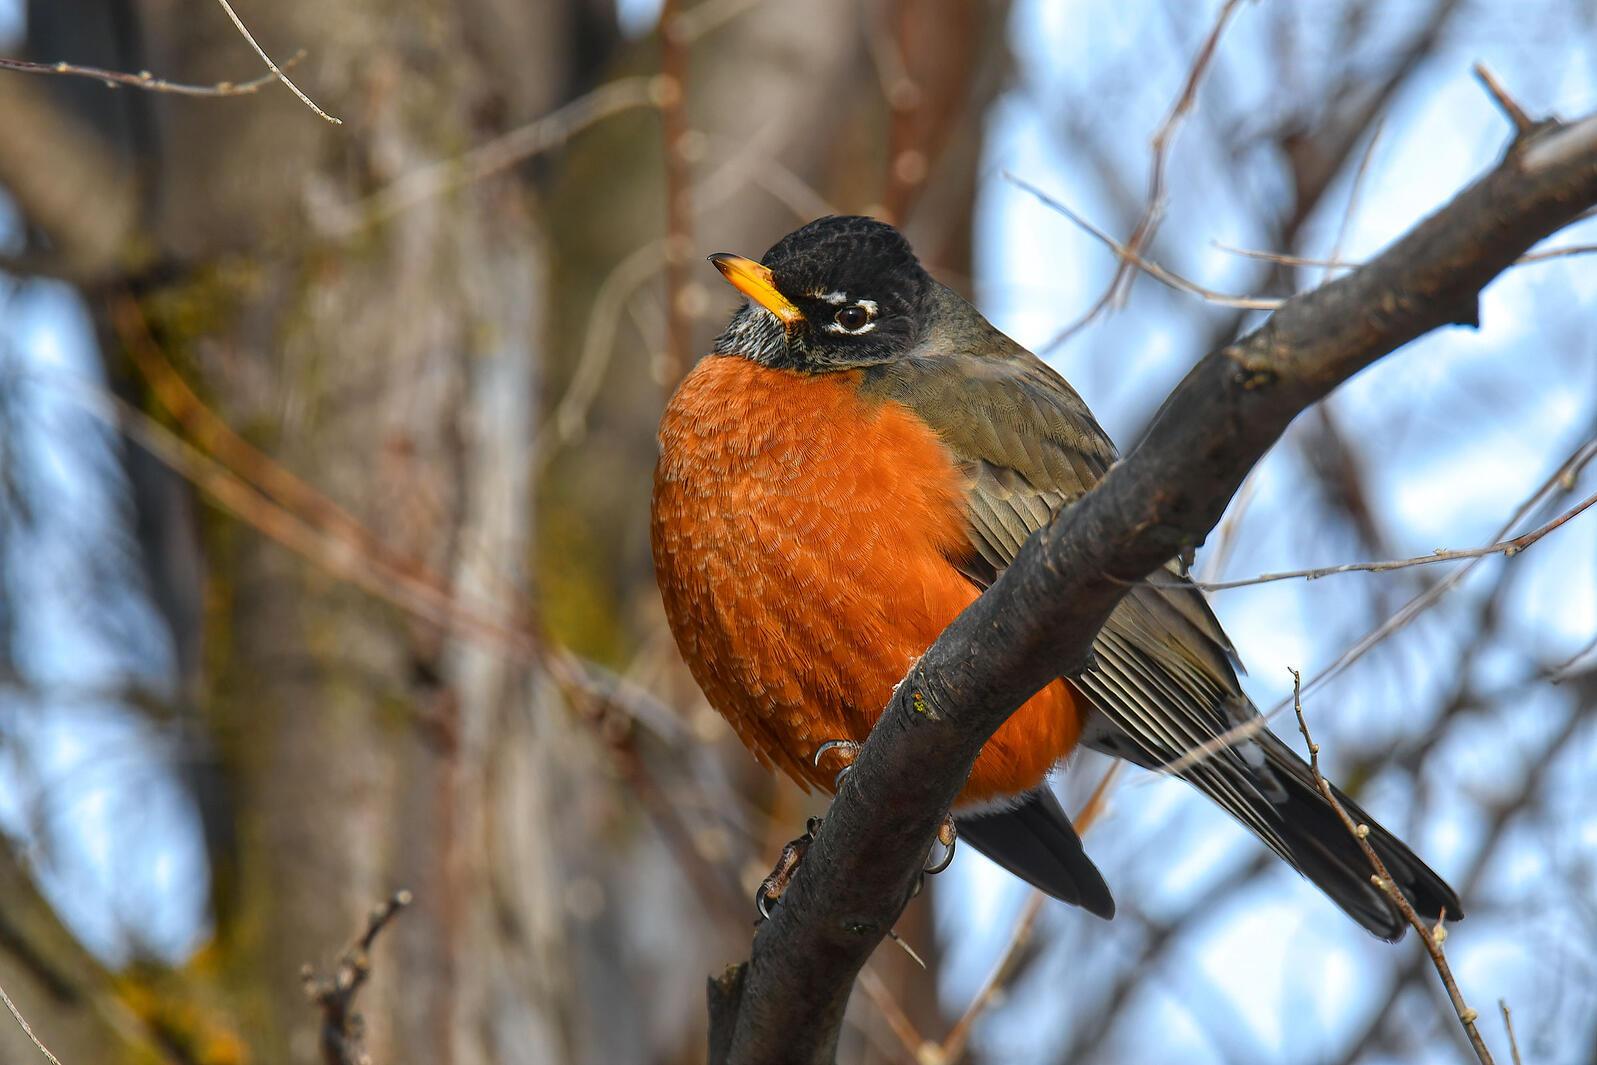 American Robin (very good birb). David Hutson/Audubon Photography Awards